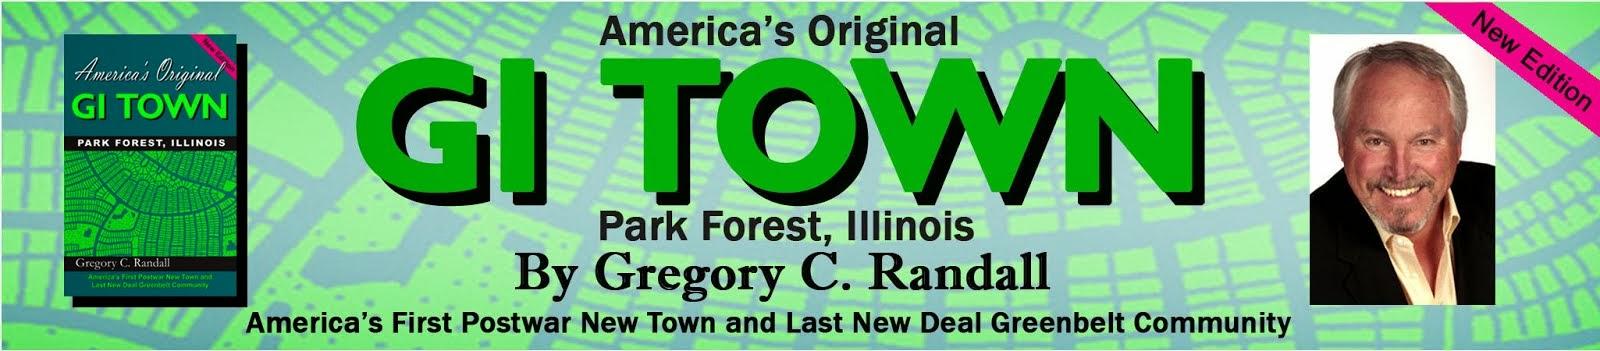 GI TOWN - Park Forest, Illinois